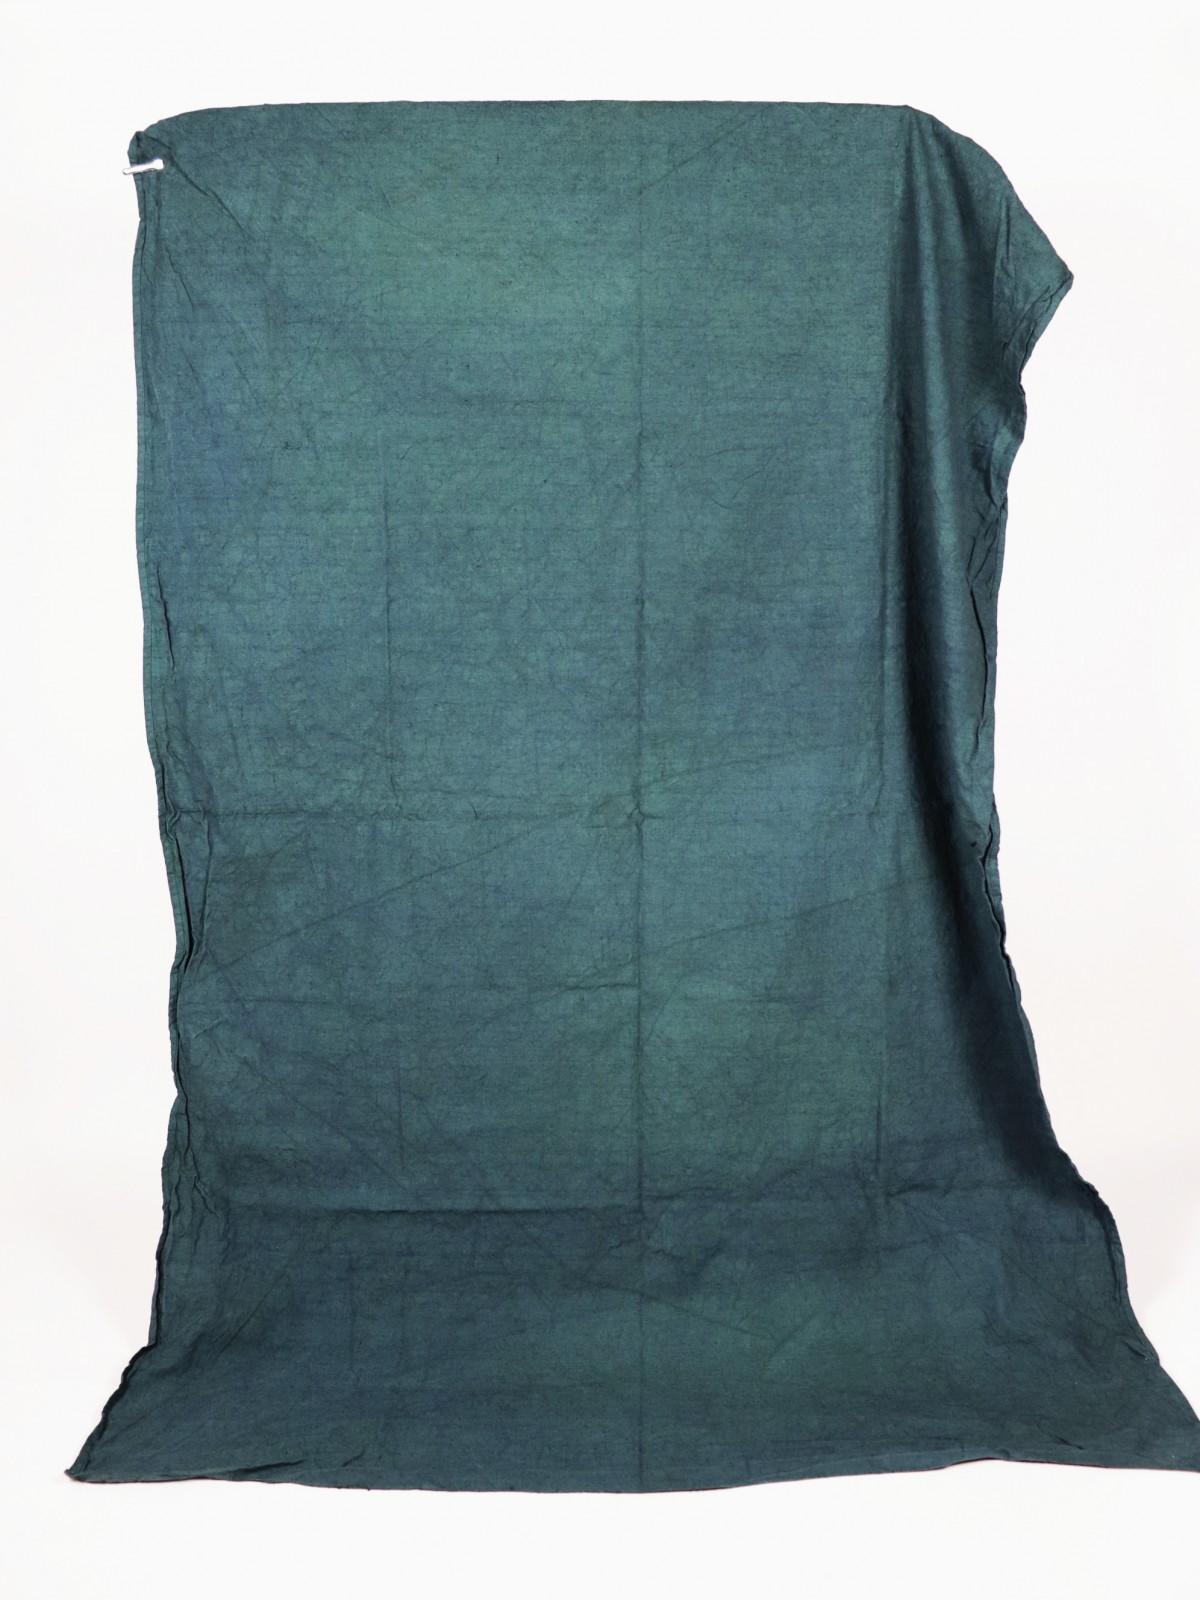 early1900's, dyd linen, fench linen fabric, sheet